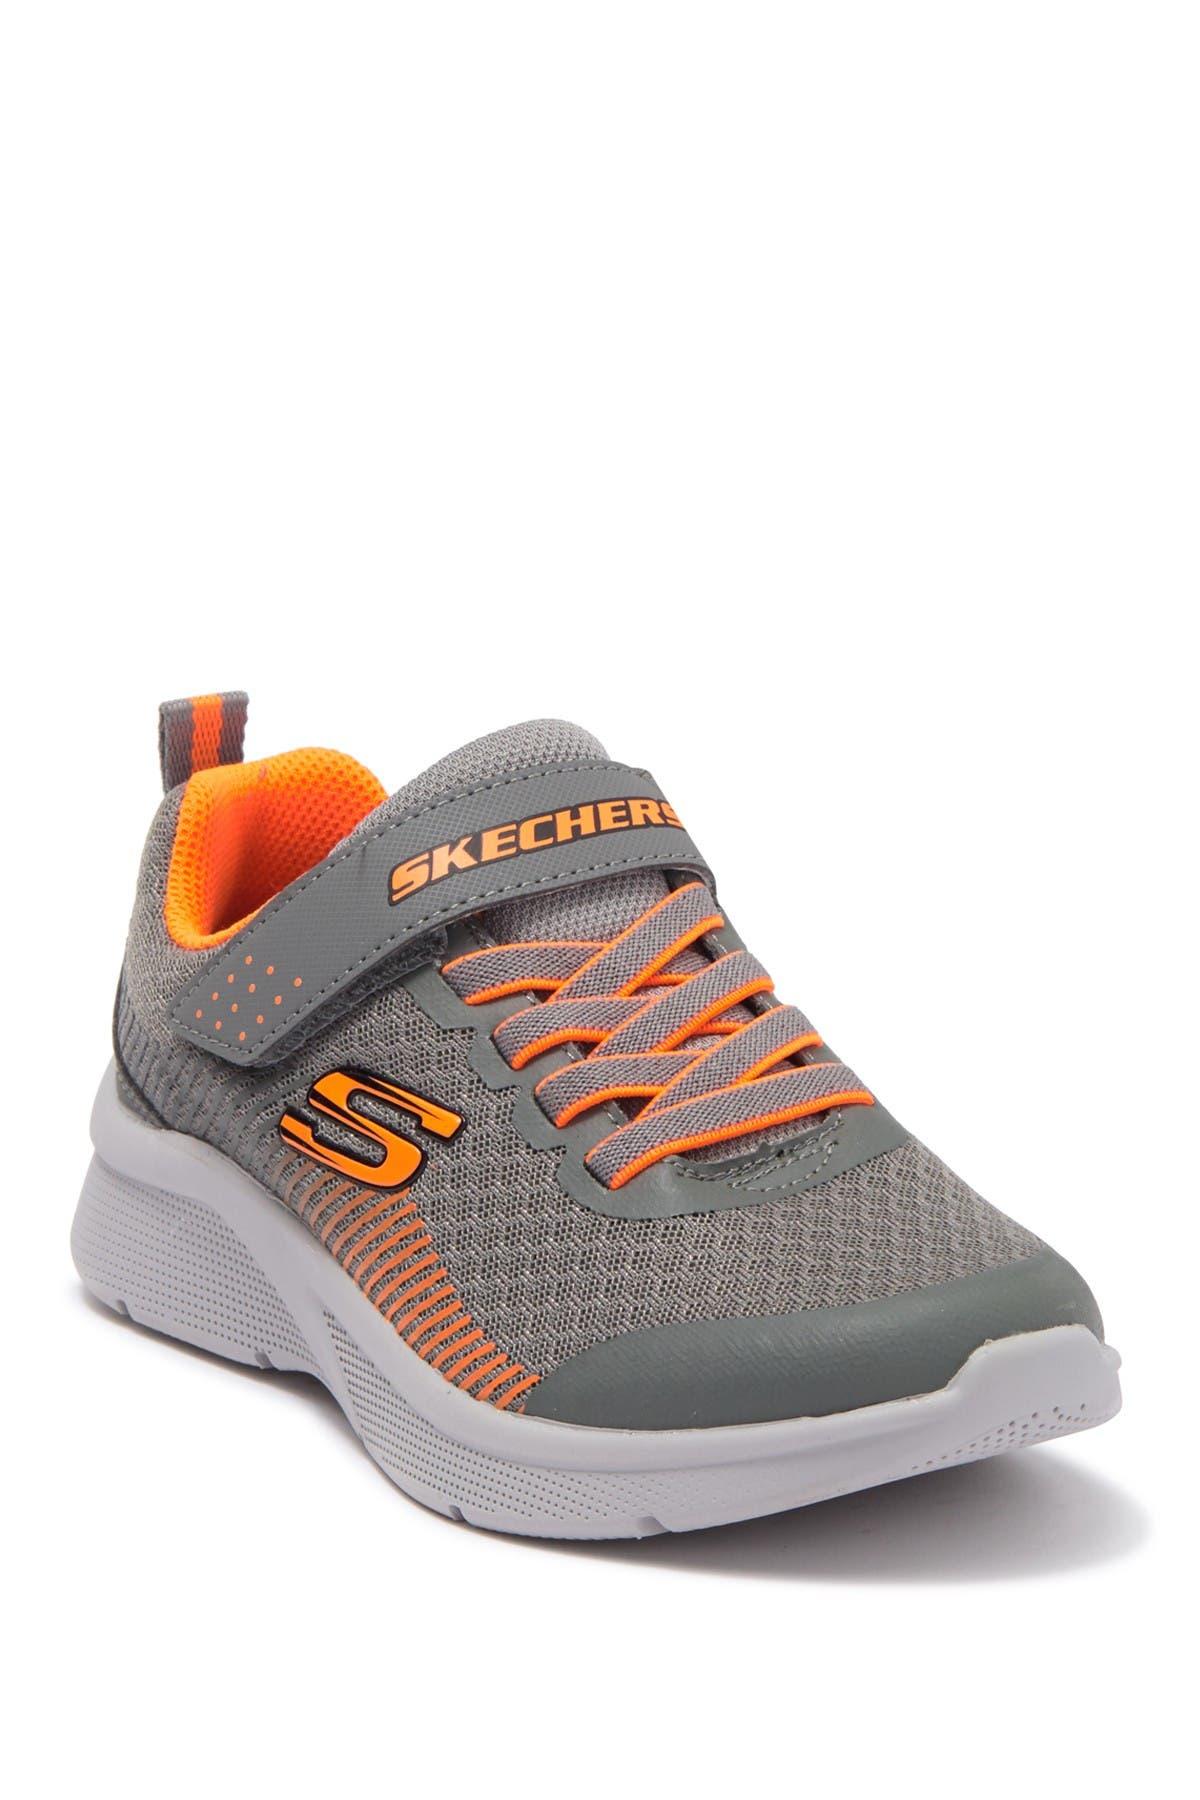 Image of Skechers Microspec - Gorza Sneaker